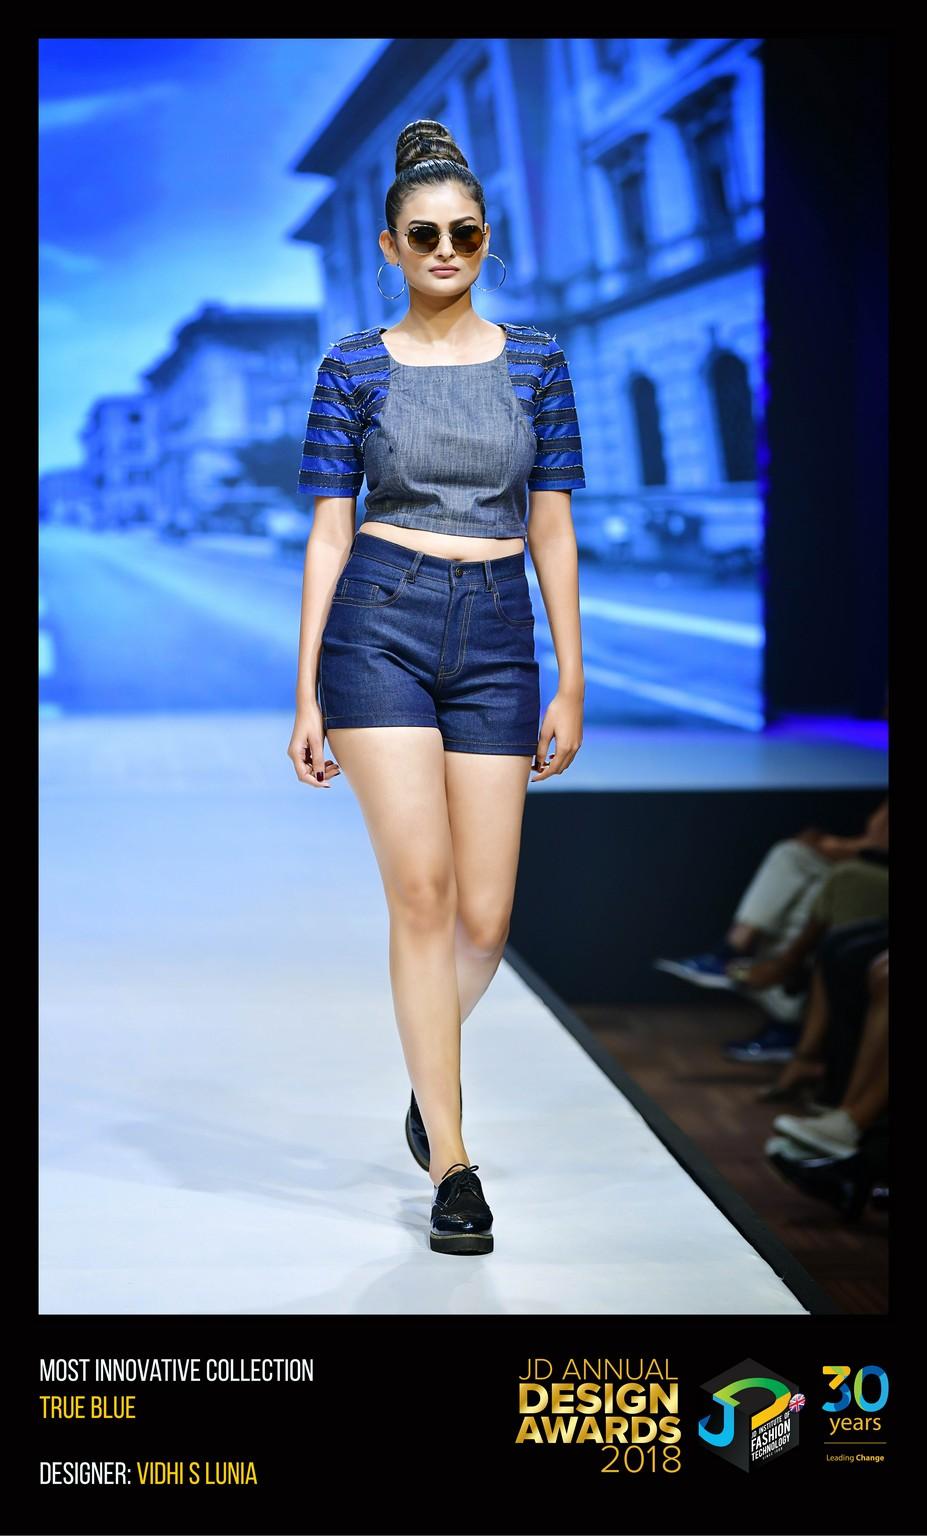 True Blue – Change – JD Annual Design Awards 2018 | Designer: Vidhi Lunia (ADFD 2015) | Photography : Jerin Nath (@jerin_nath) true blue - True Blue Photos JDW FB3 - True Blue – Change – JD Annual Design Awards 2018